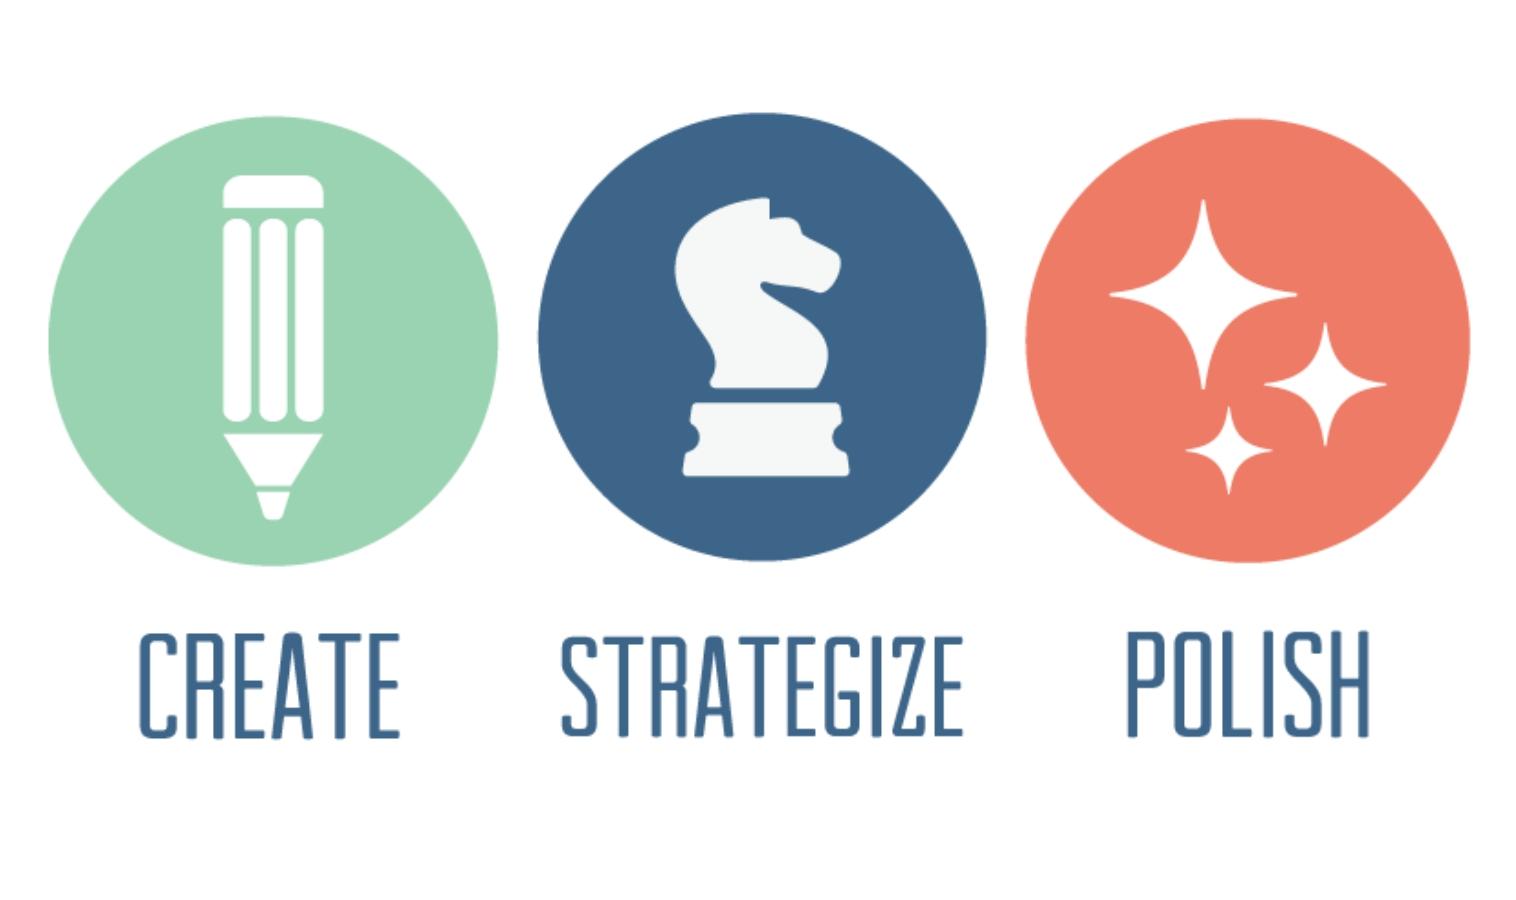 Create Strategize Polish